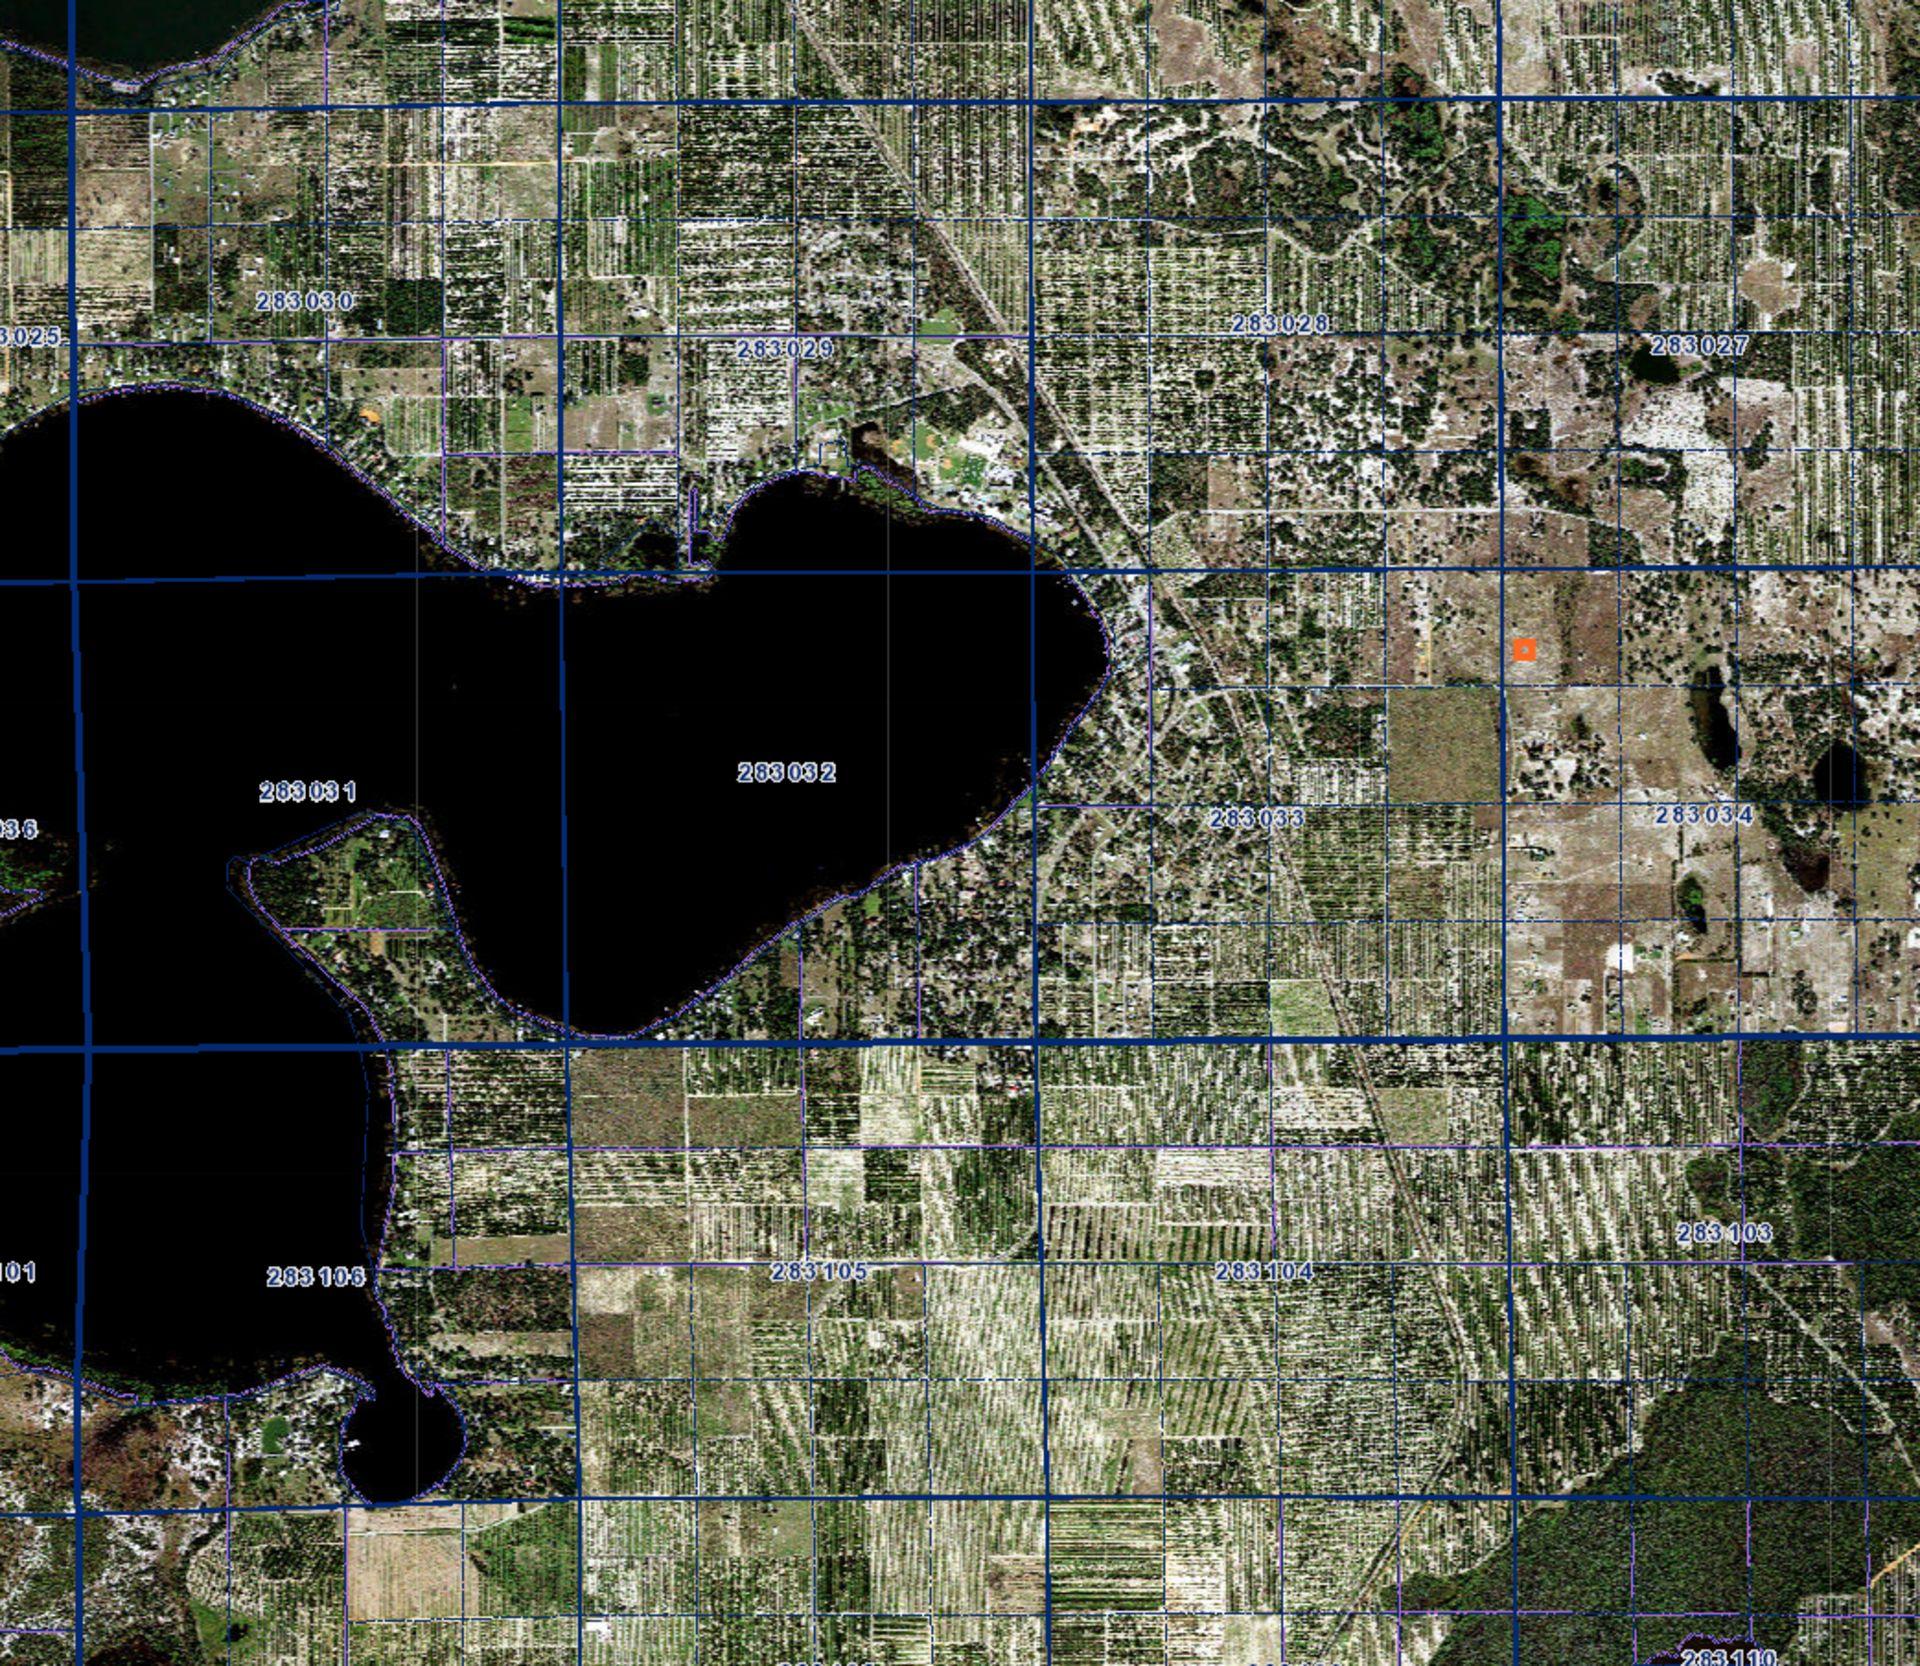 Peaceful Polk County, Florida! - Image 4 of 6